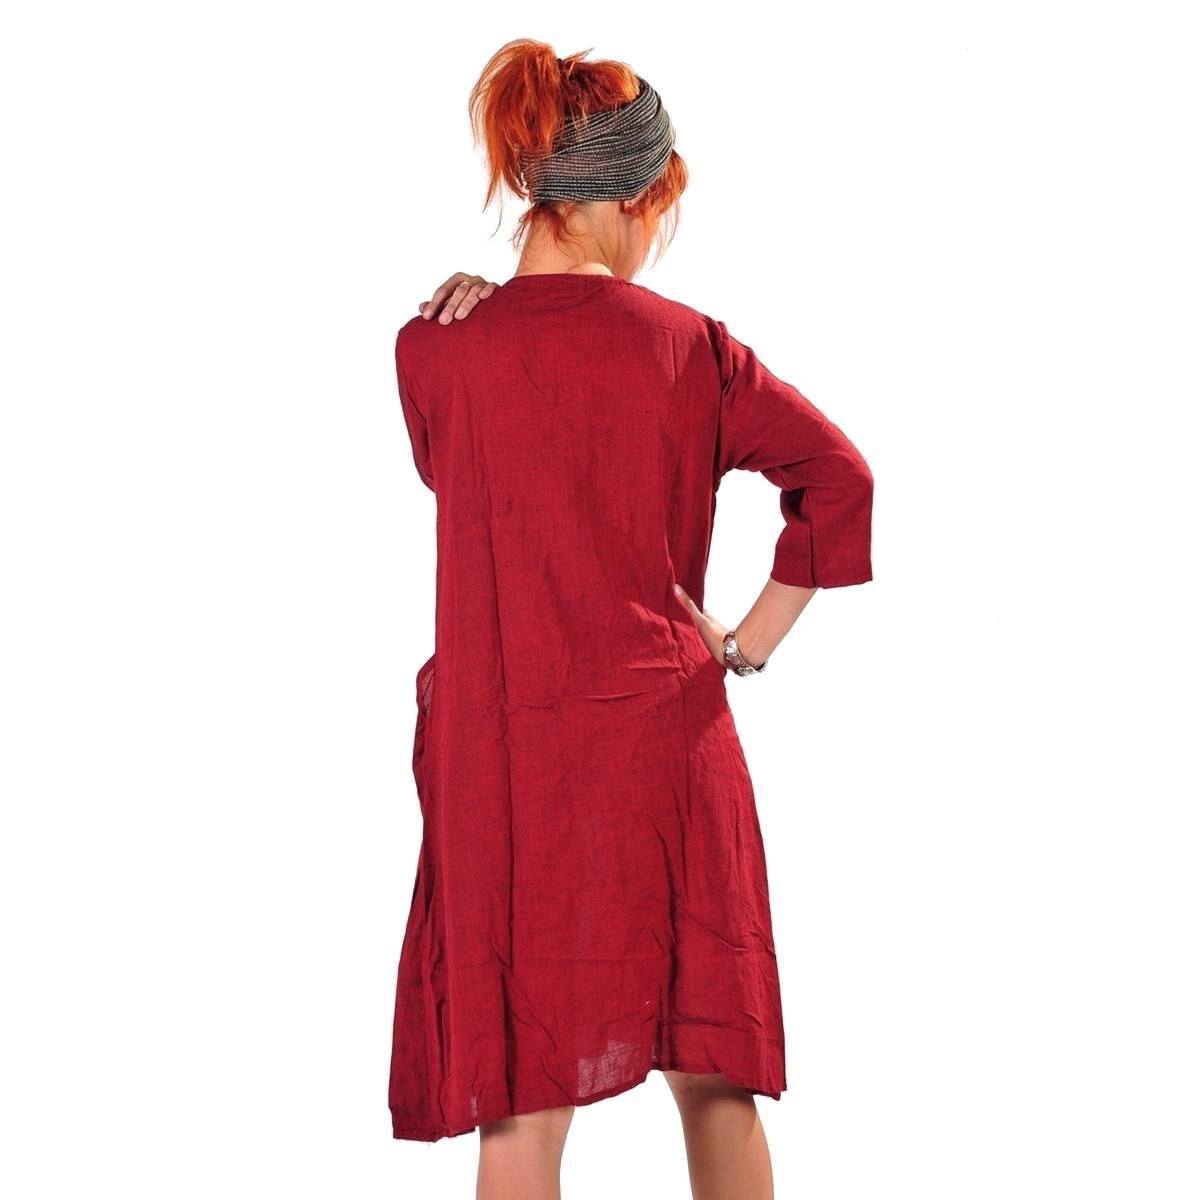 kleid trägerkleid maxikleid abendkleid sommer kleider knie